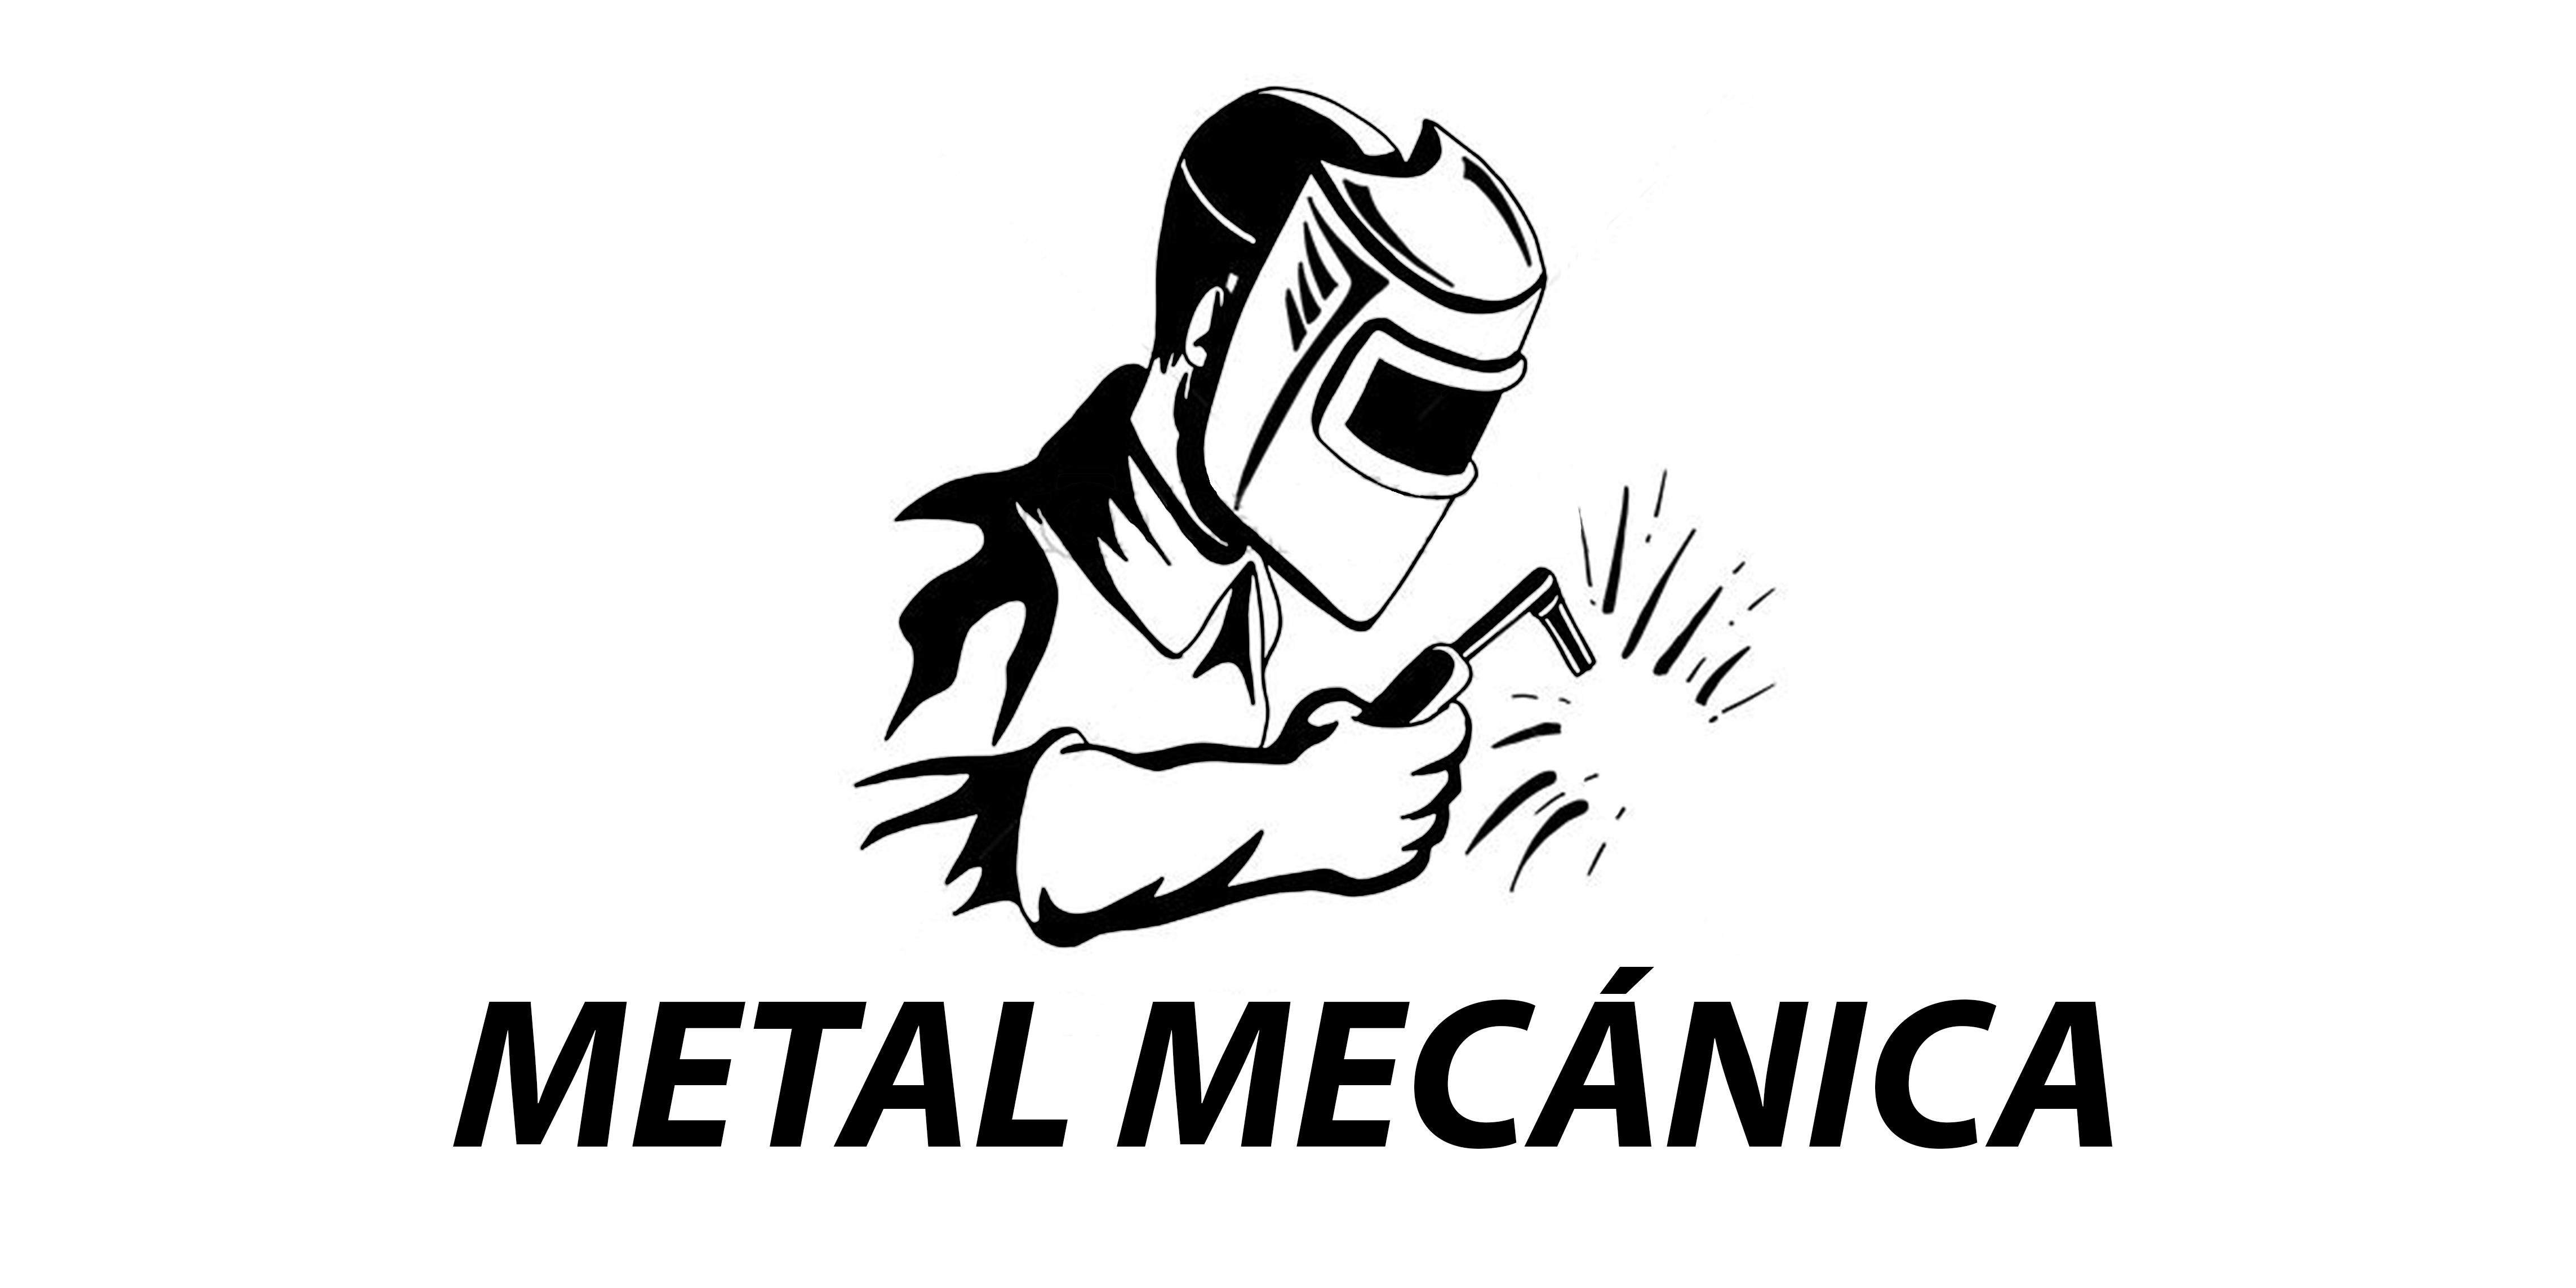 METAL MECÁNICA